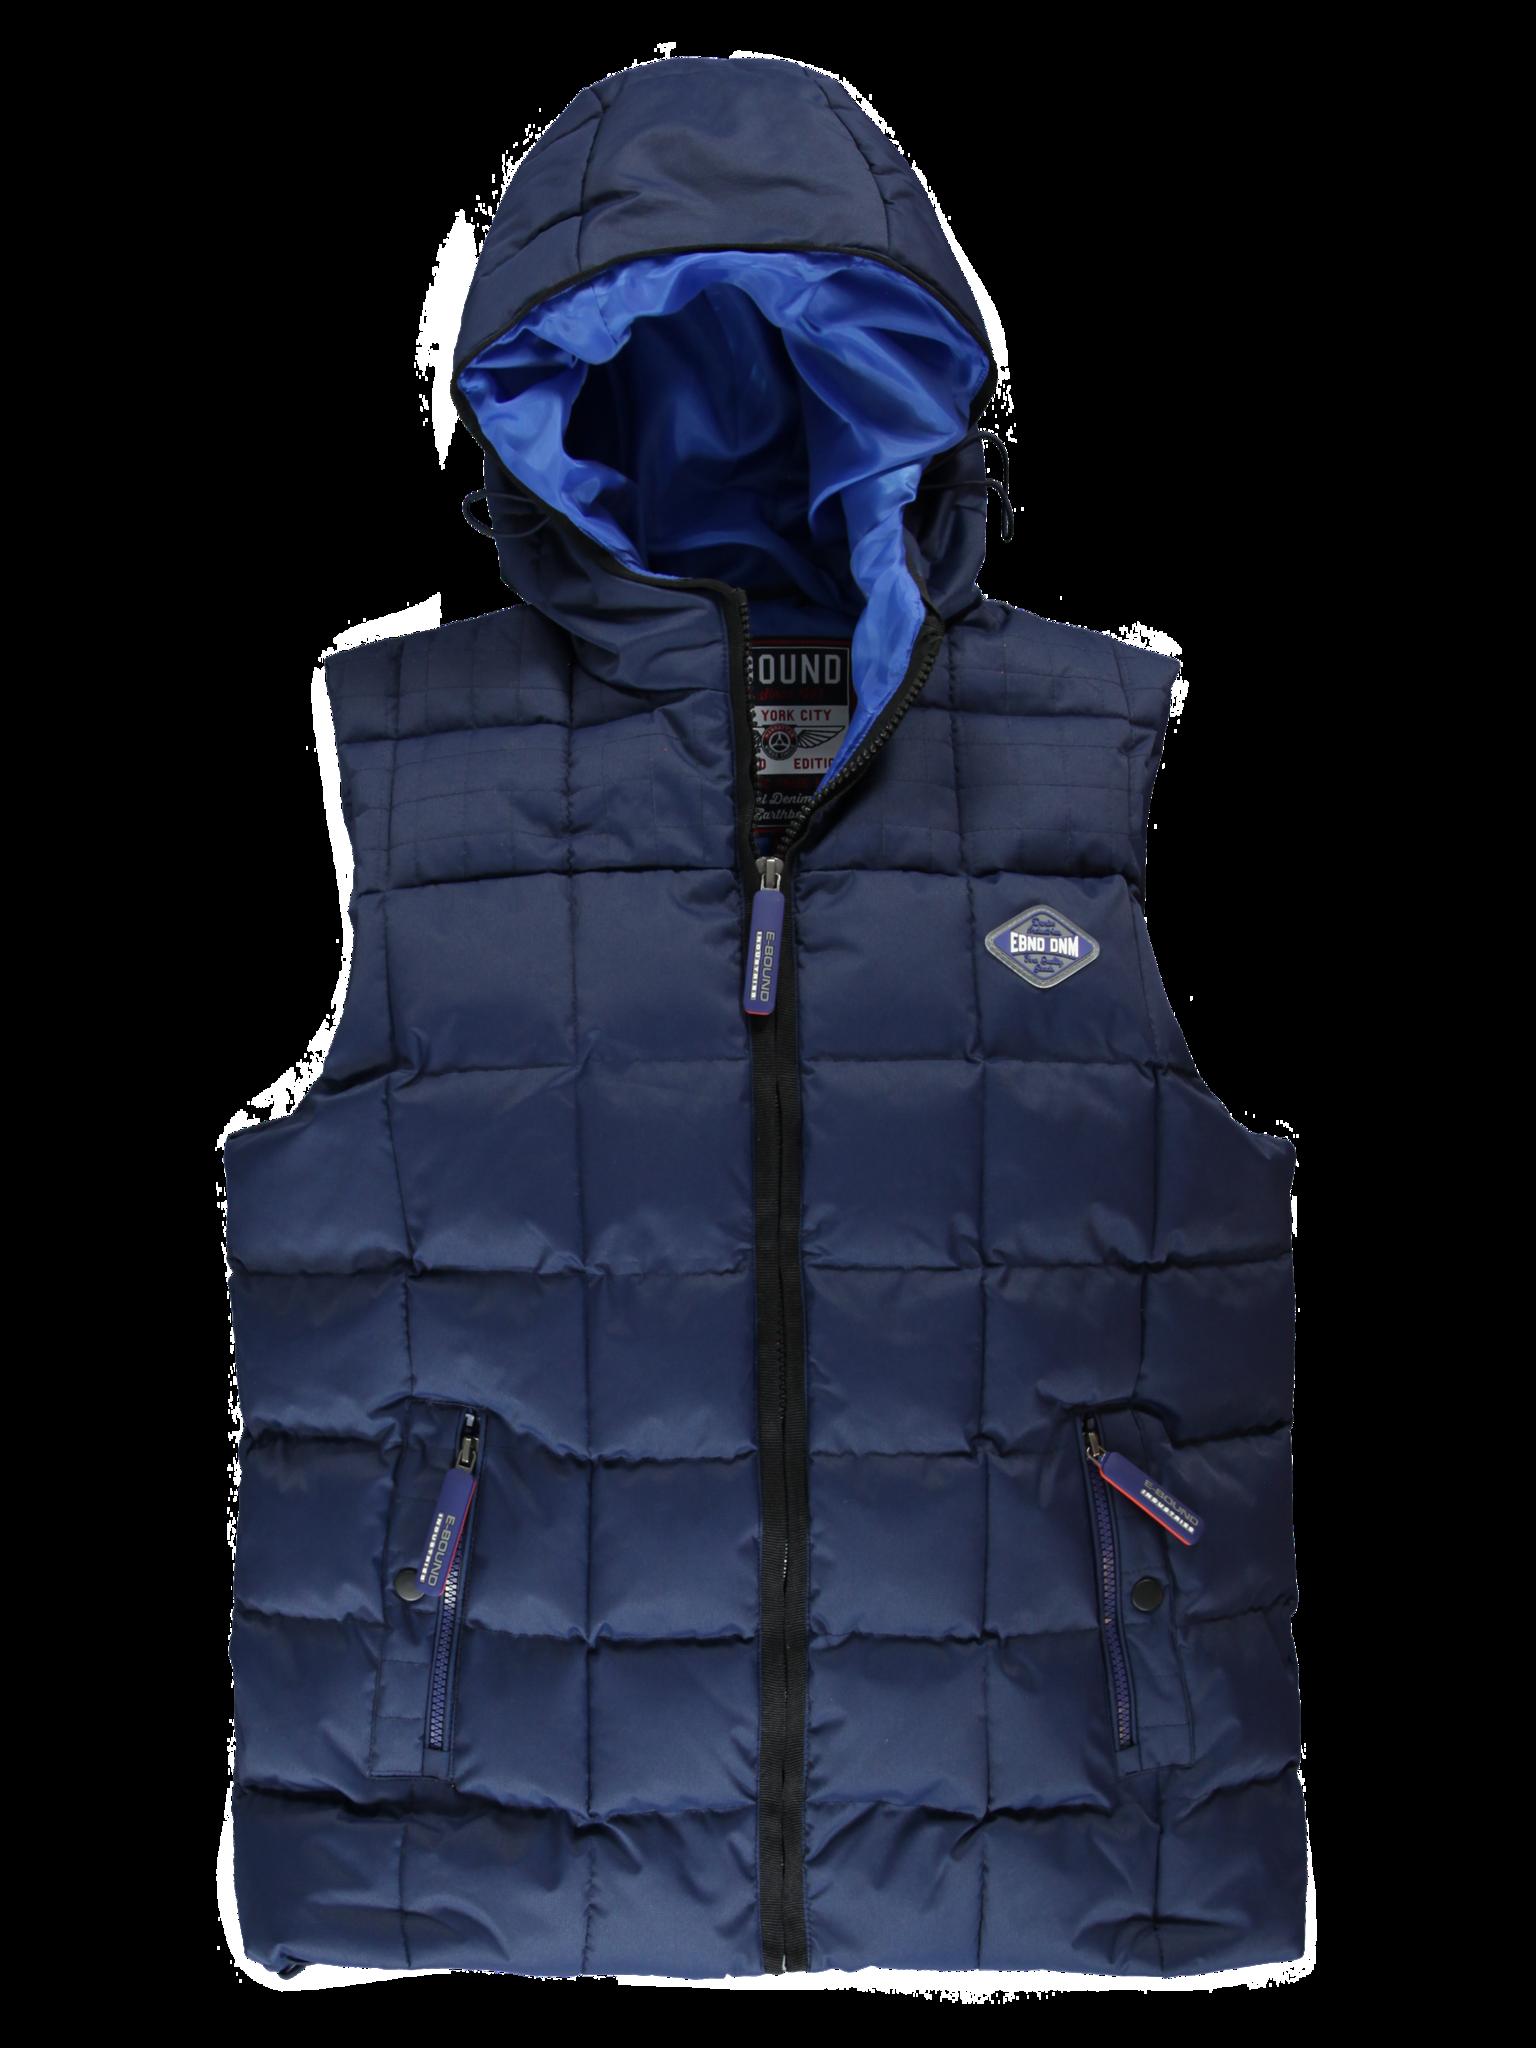 All Brands | Winterproducts Men | Bodywarmer | 16 pcs/box